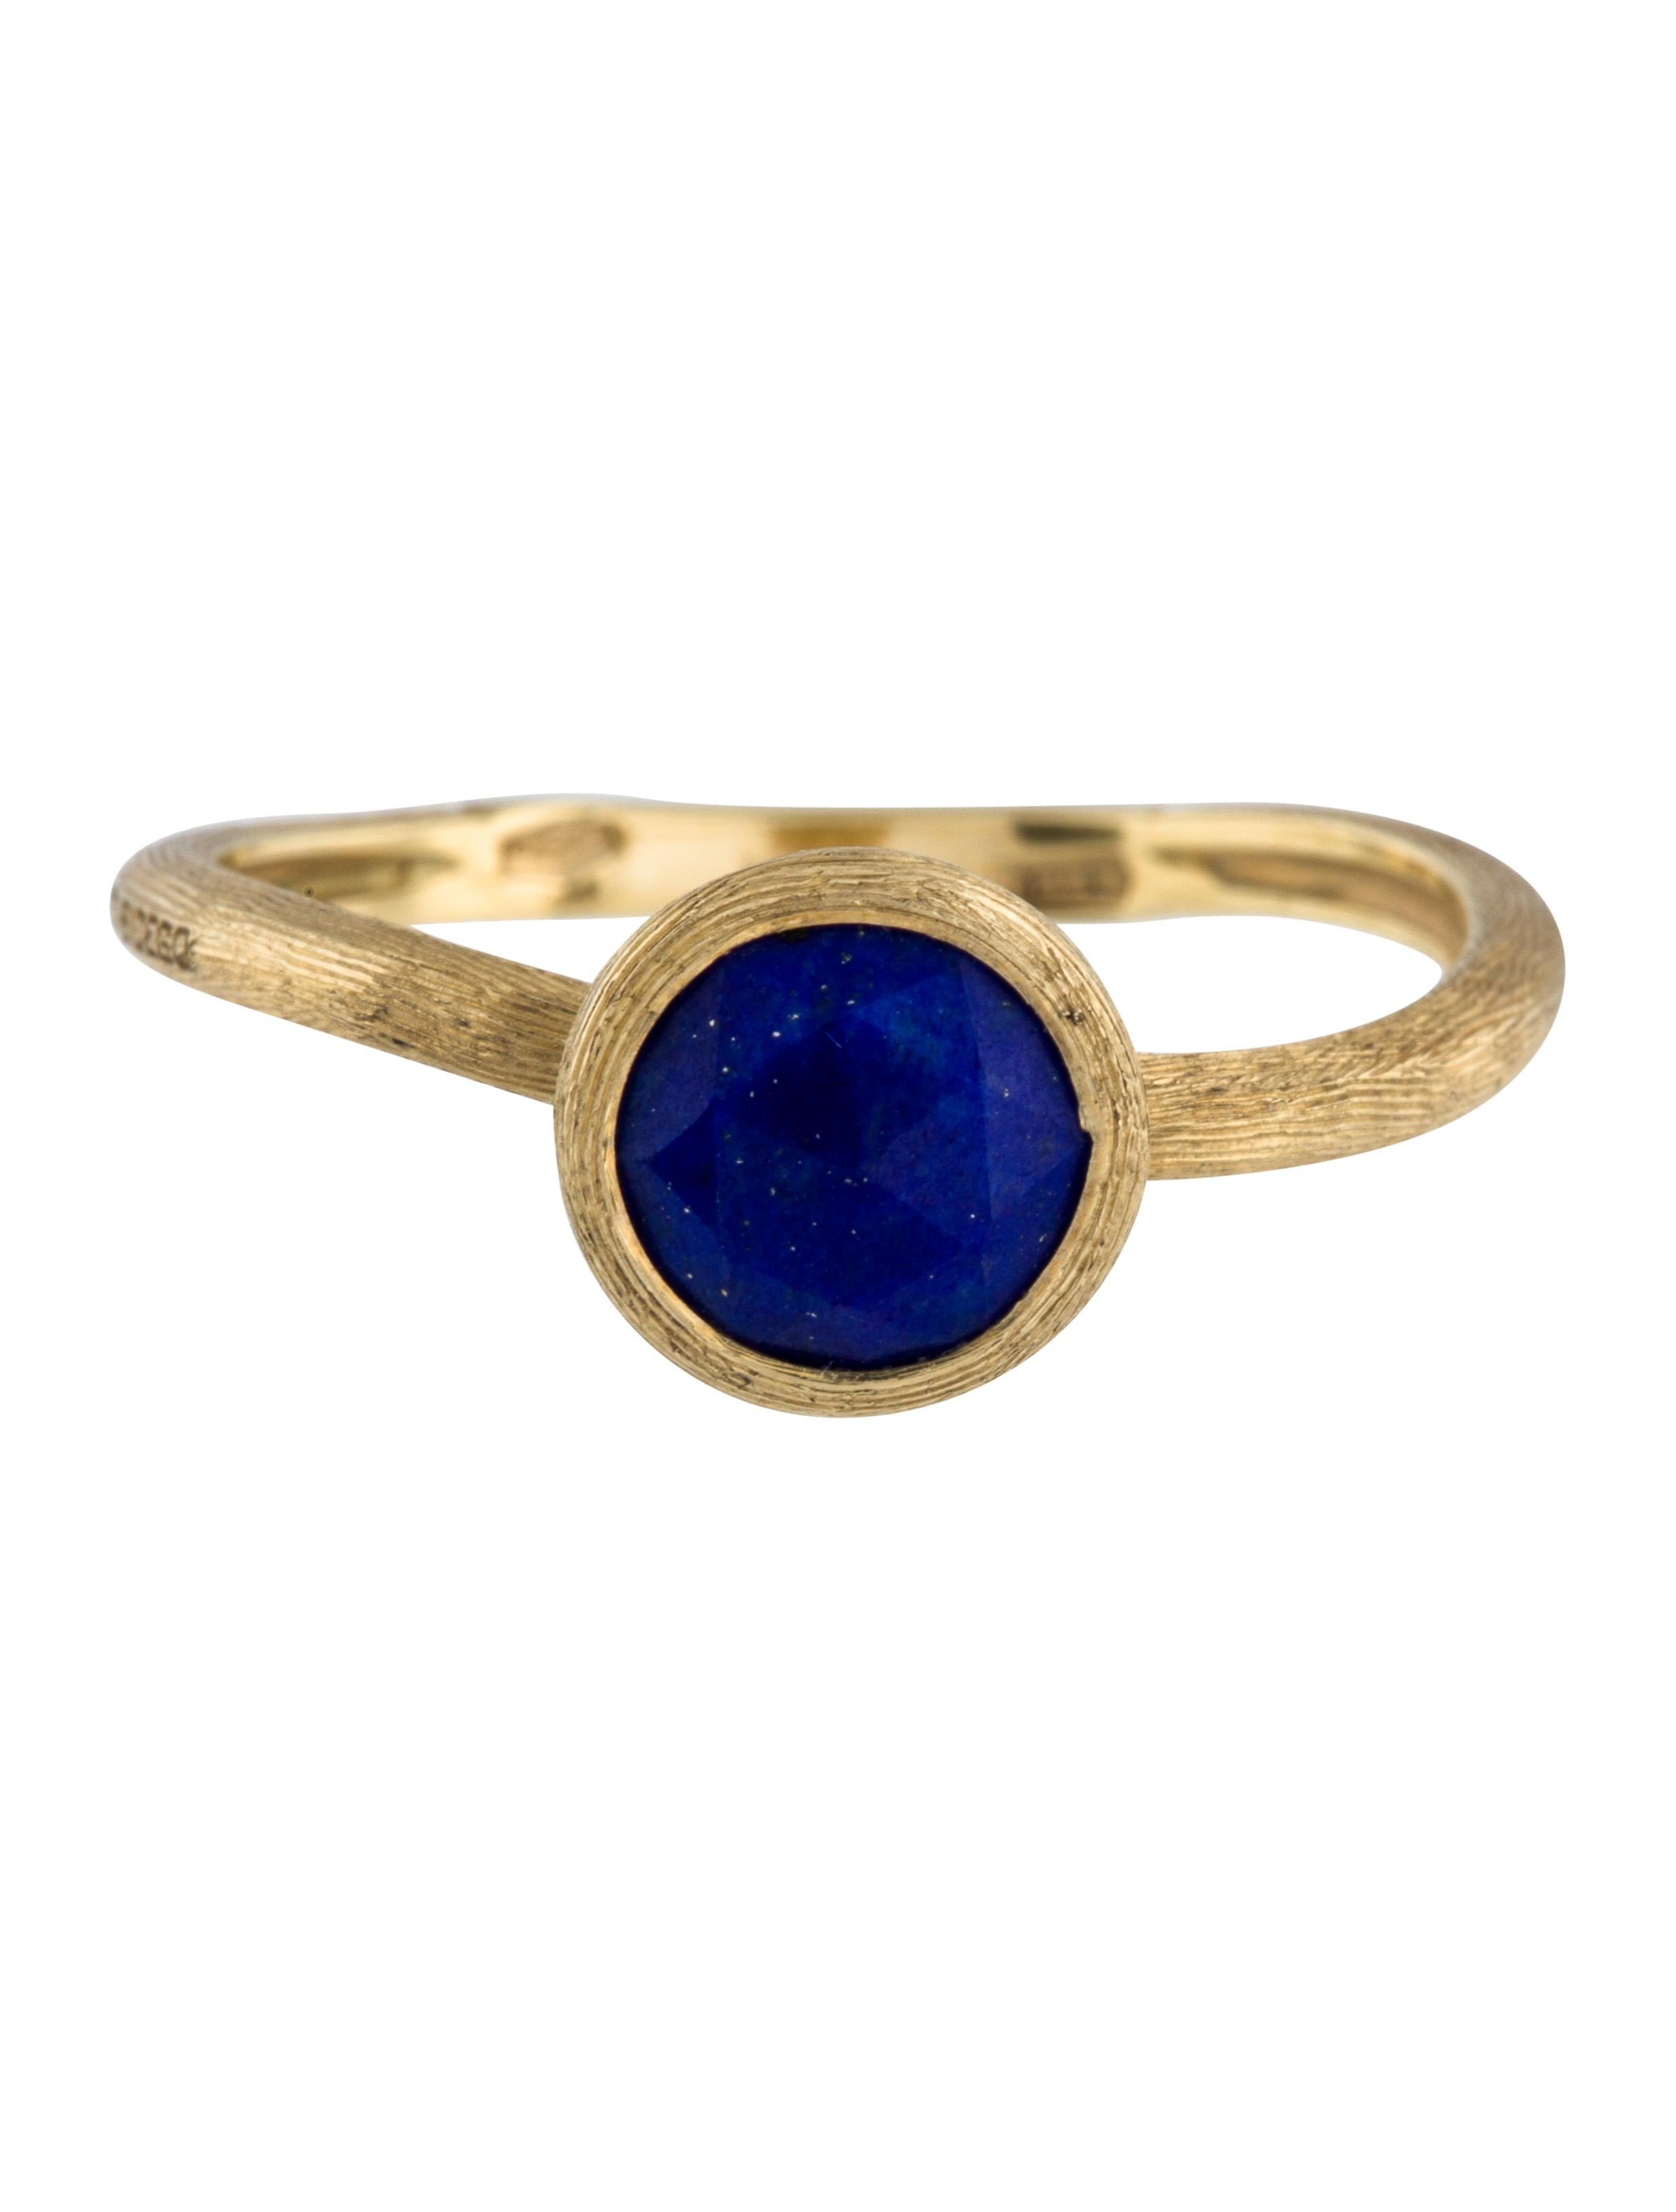 Lapis Lazuli Rings For Sale